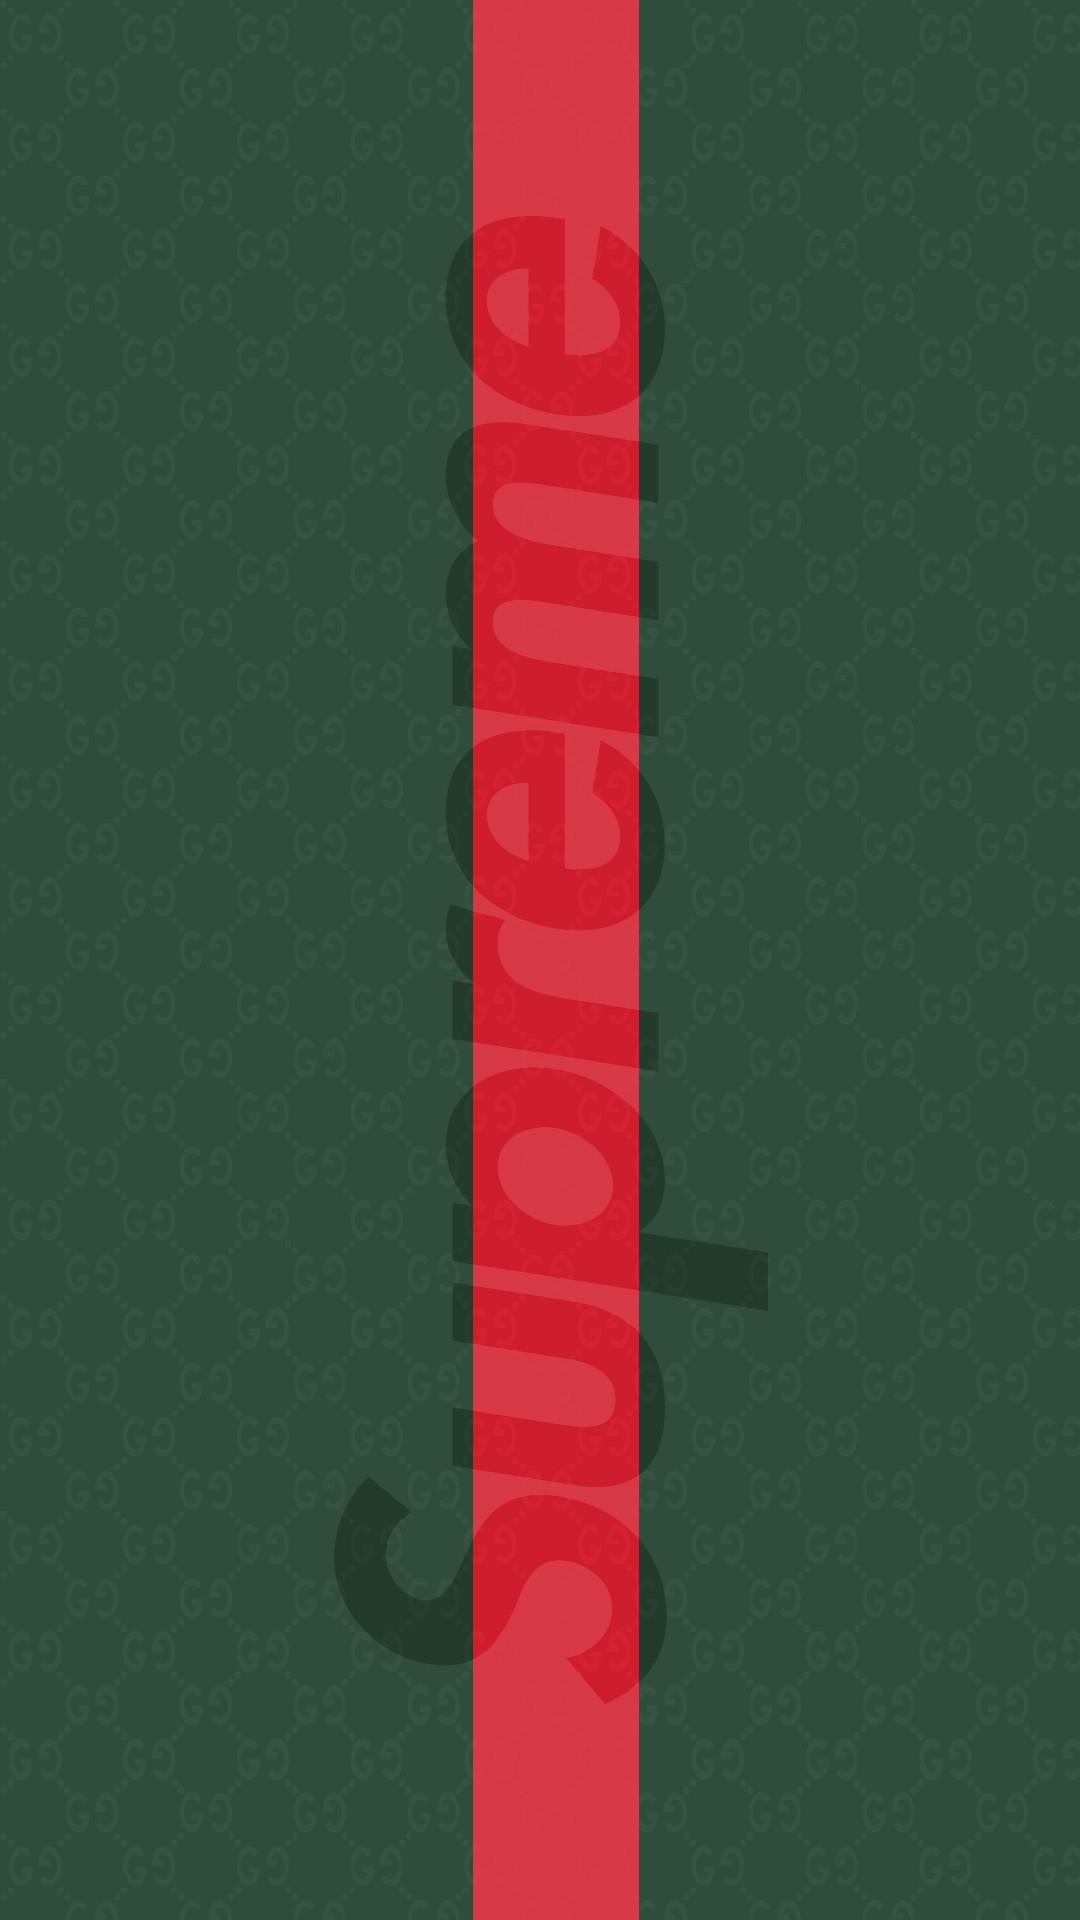 Stussy Hd Wallpaper Bape Iphone Wallpaper 63 Images